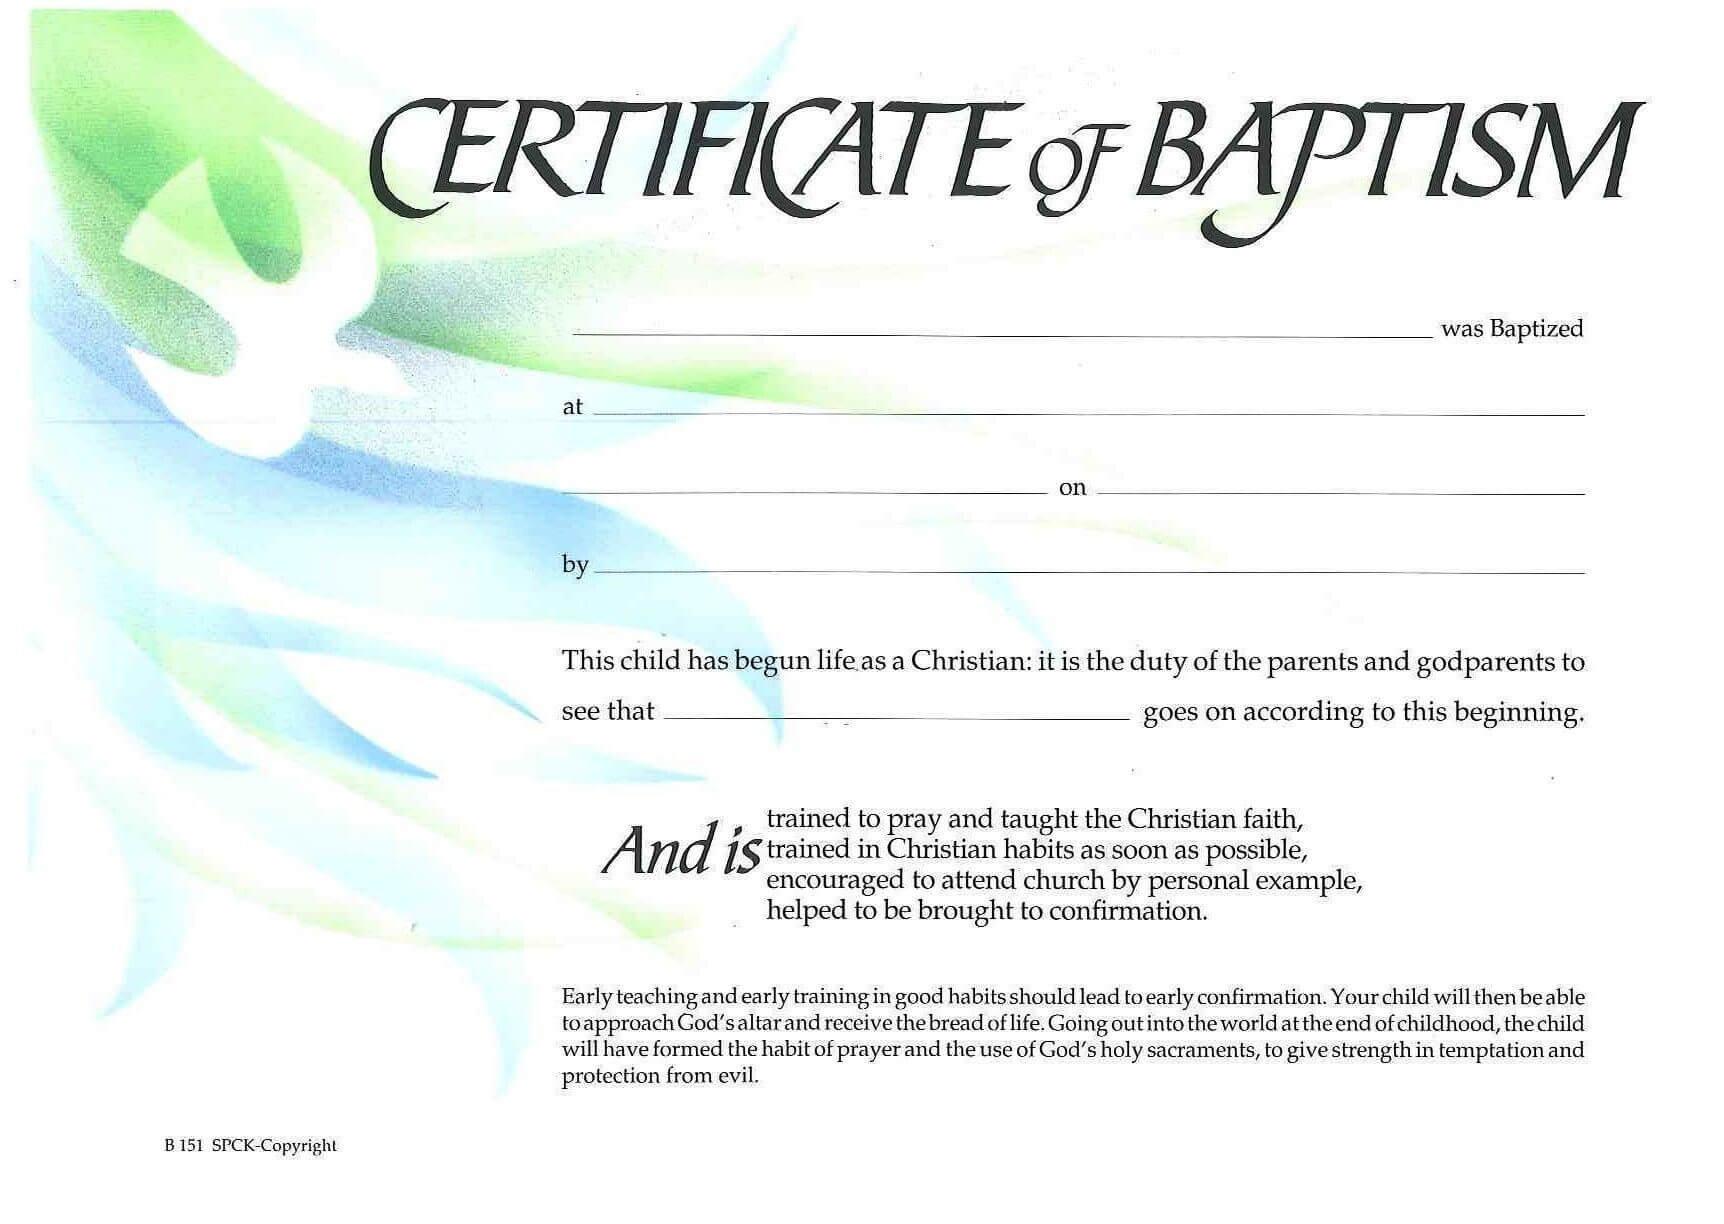 Baptism Certificate Xp4Eamuz | Certificate Templates, Baby With Regard To Baptism Certificate Template Download